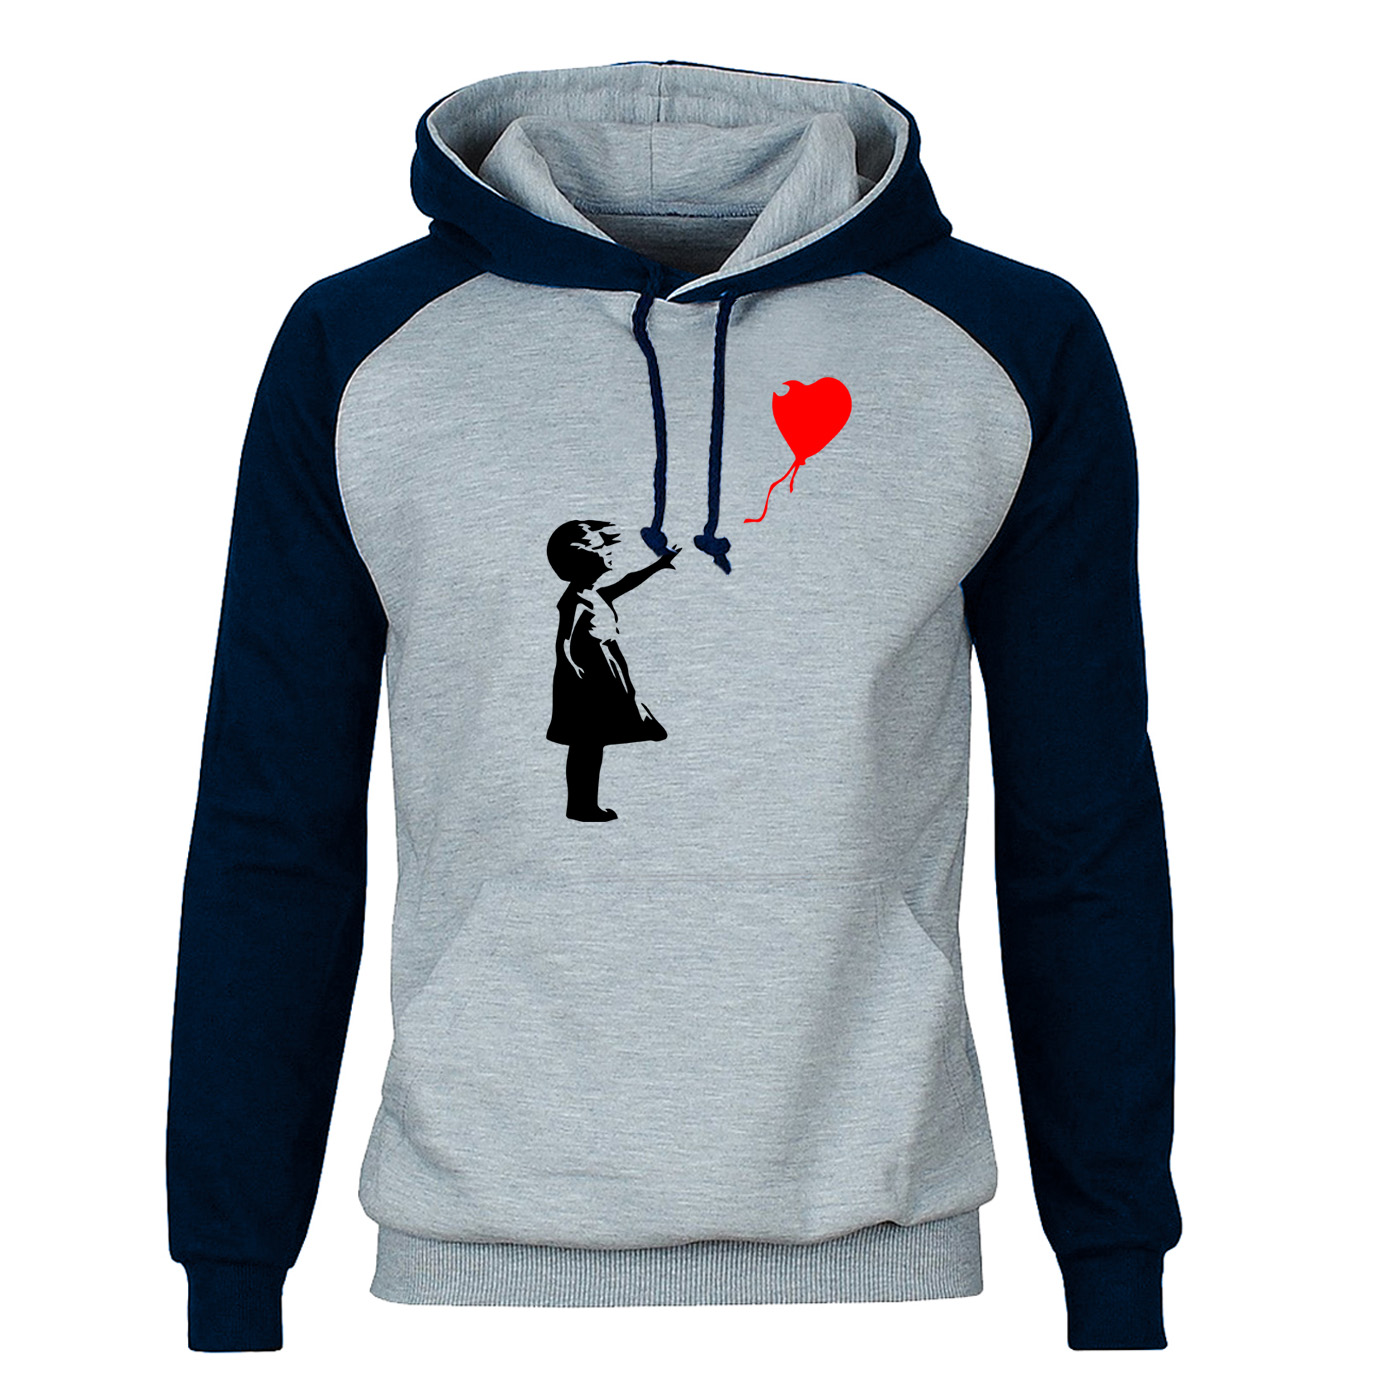 World Peace Hoodies Sweatshirts Men Kcco Balloon Girl Banksy Love Raglan Hooded Sweatshirt Hoodie Winter Autumn Warm Streetwear